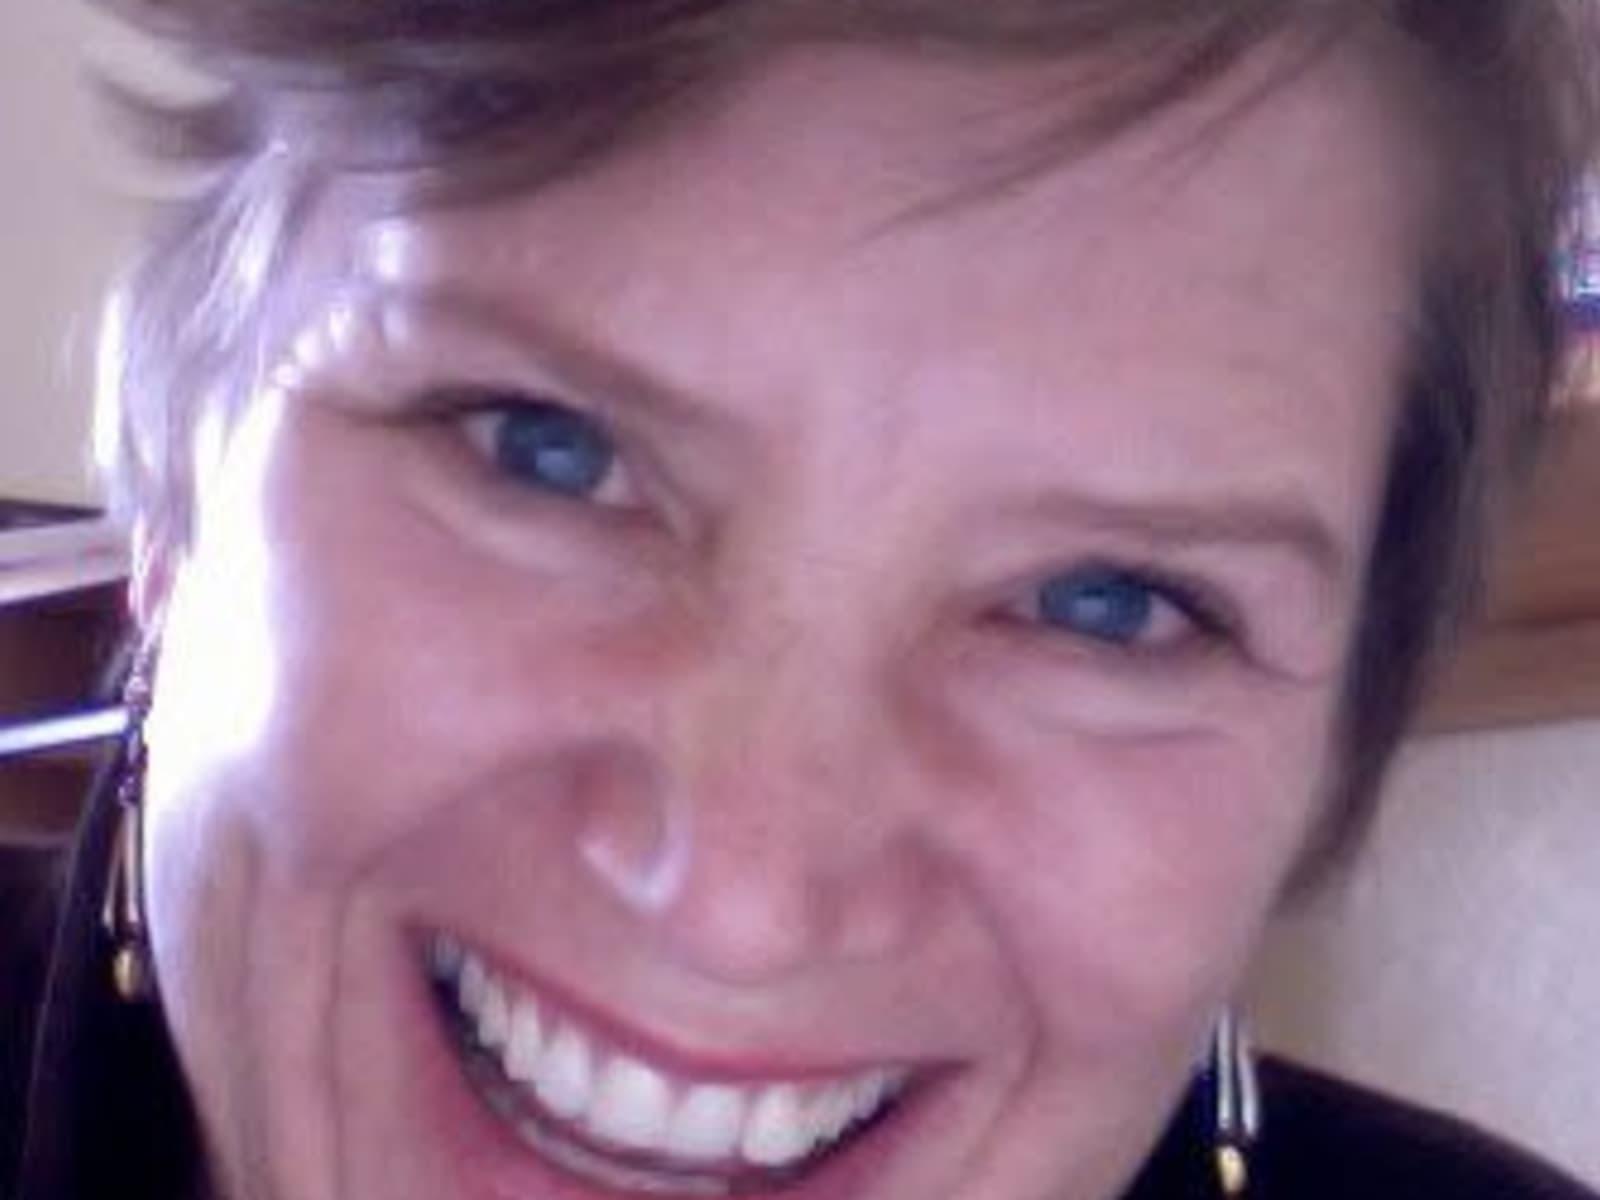 Susanne from Portland, Oregon, United States